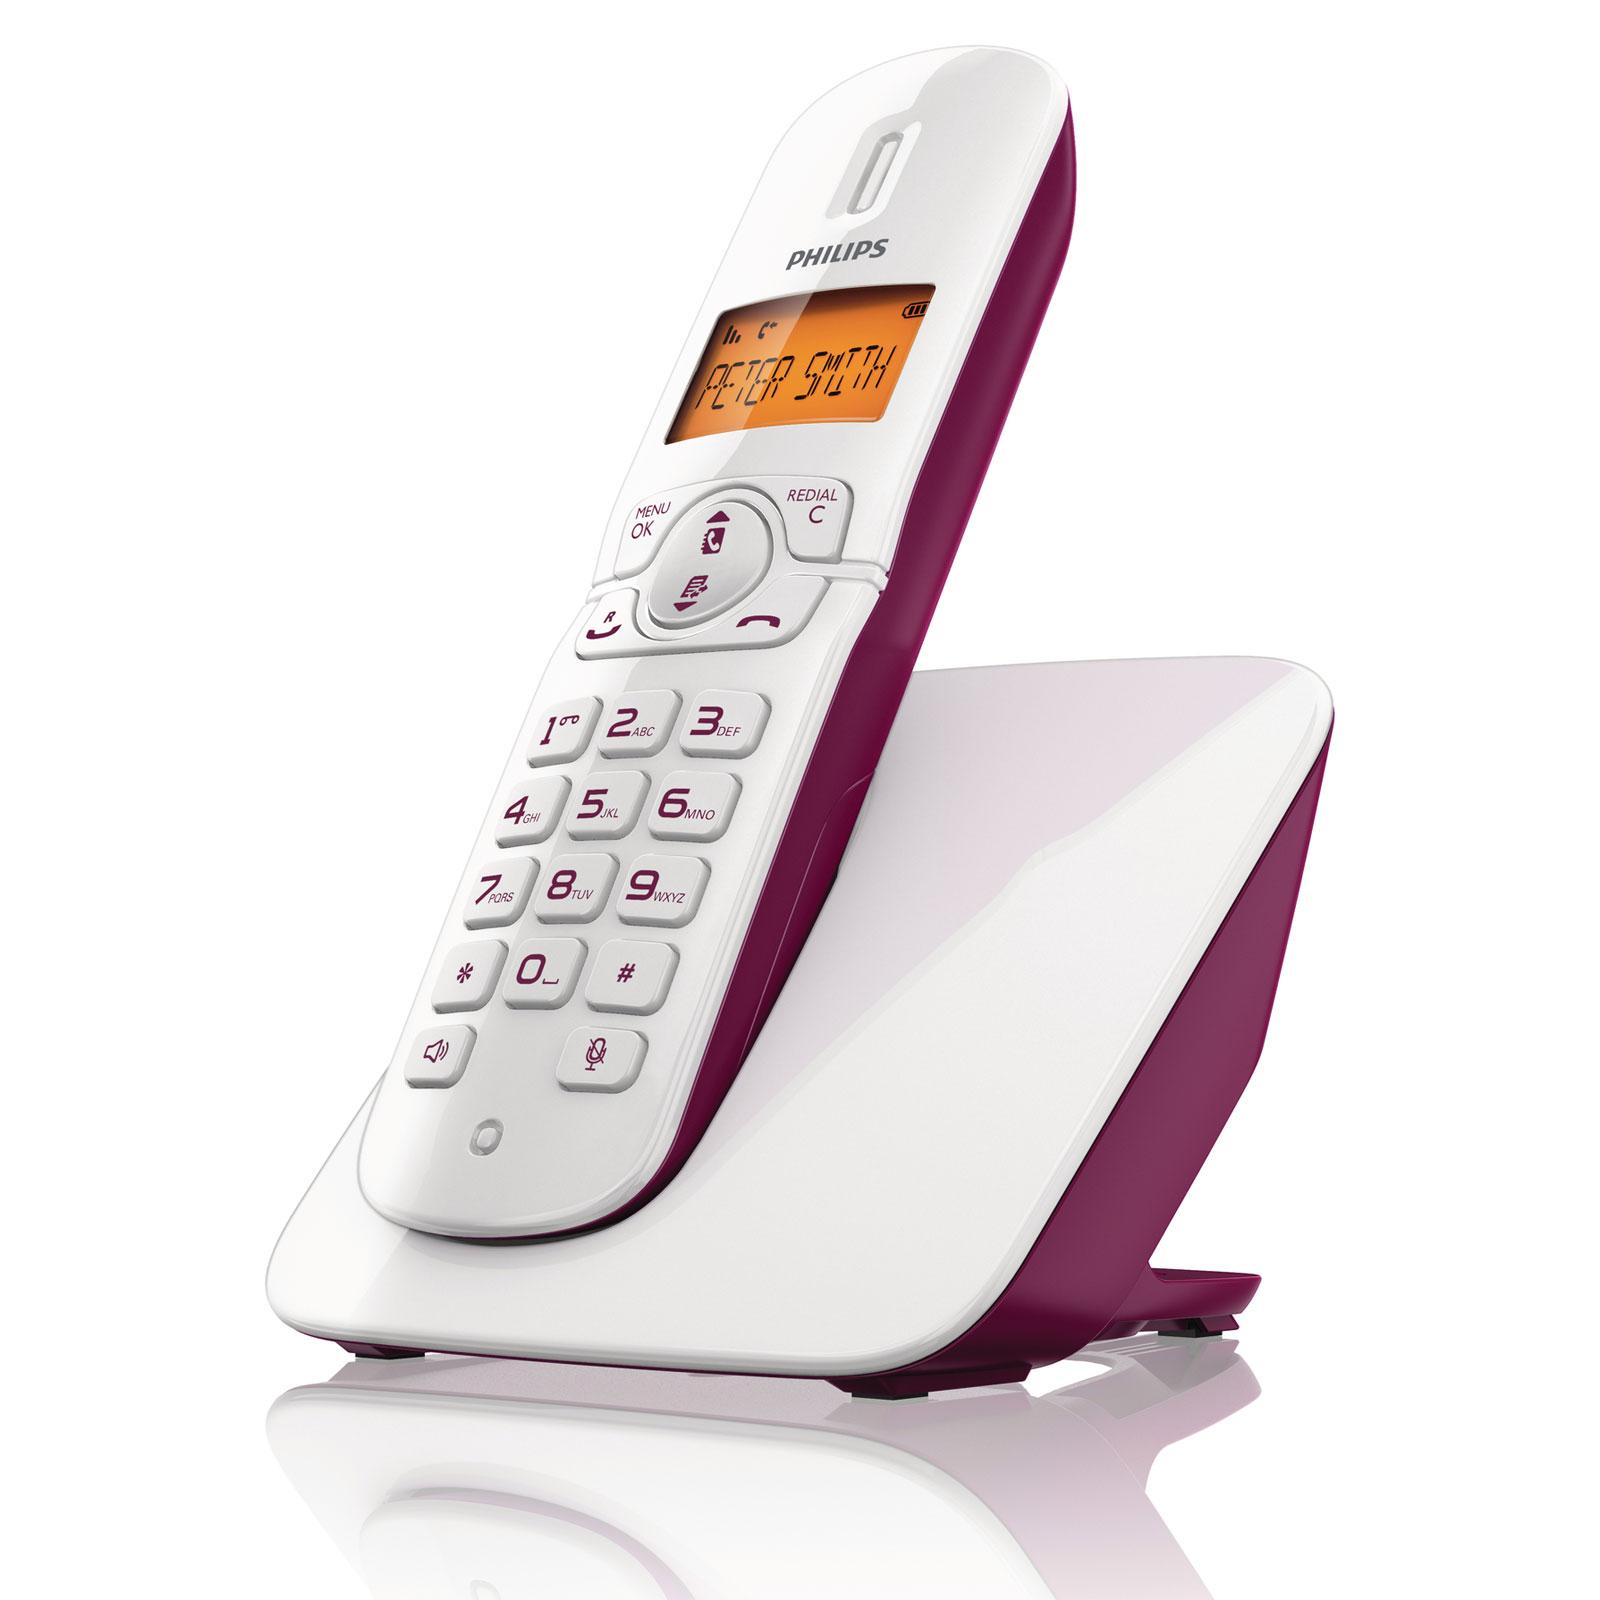 philips cd1811 blanc prune t l phone sans fil philips sur ldlc. Black Bedroom Furniture Sets. Home Design Ideas